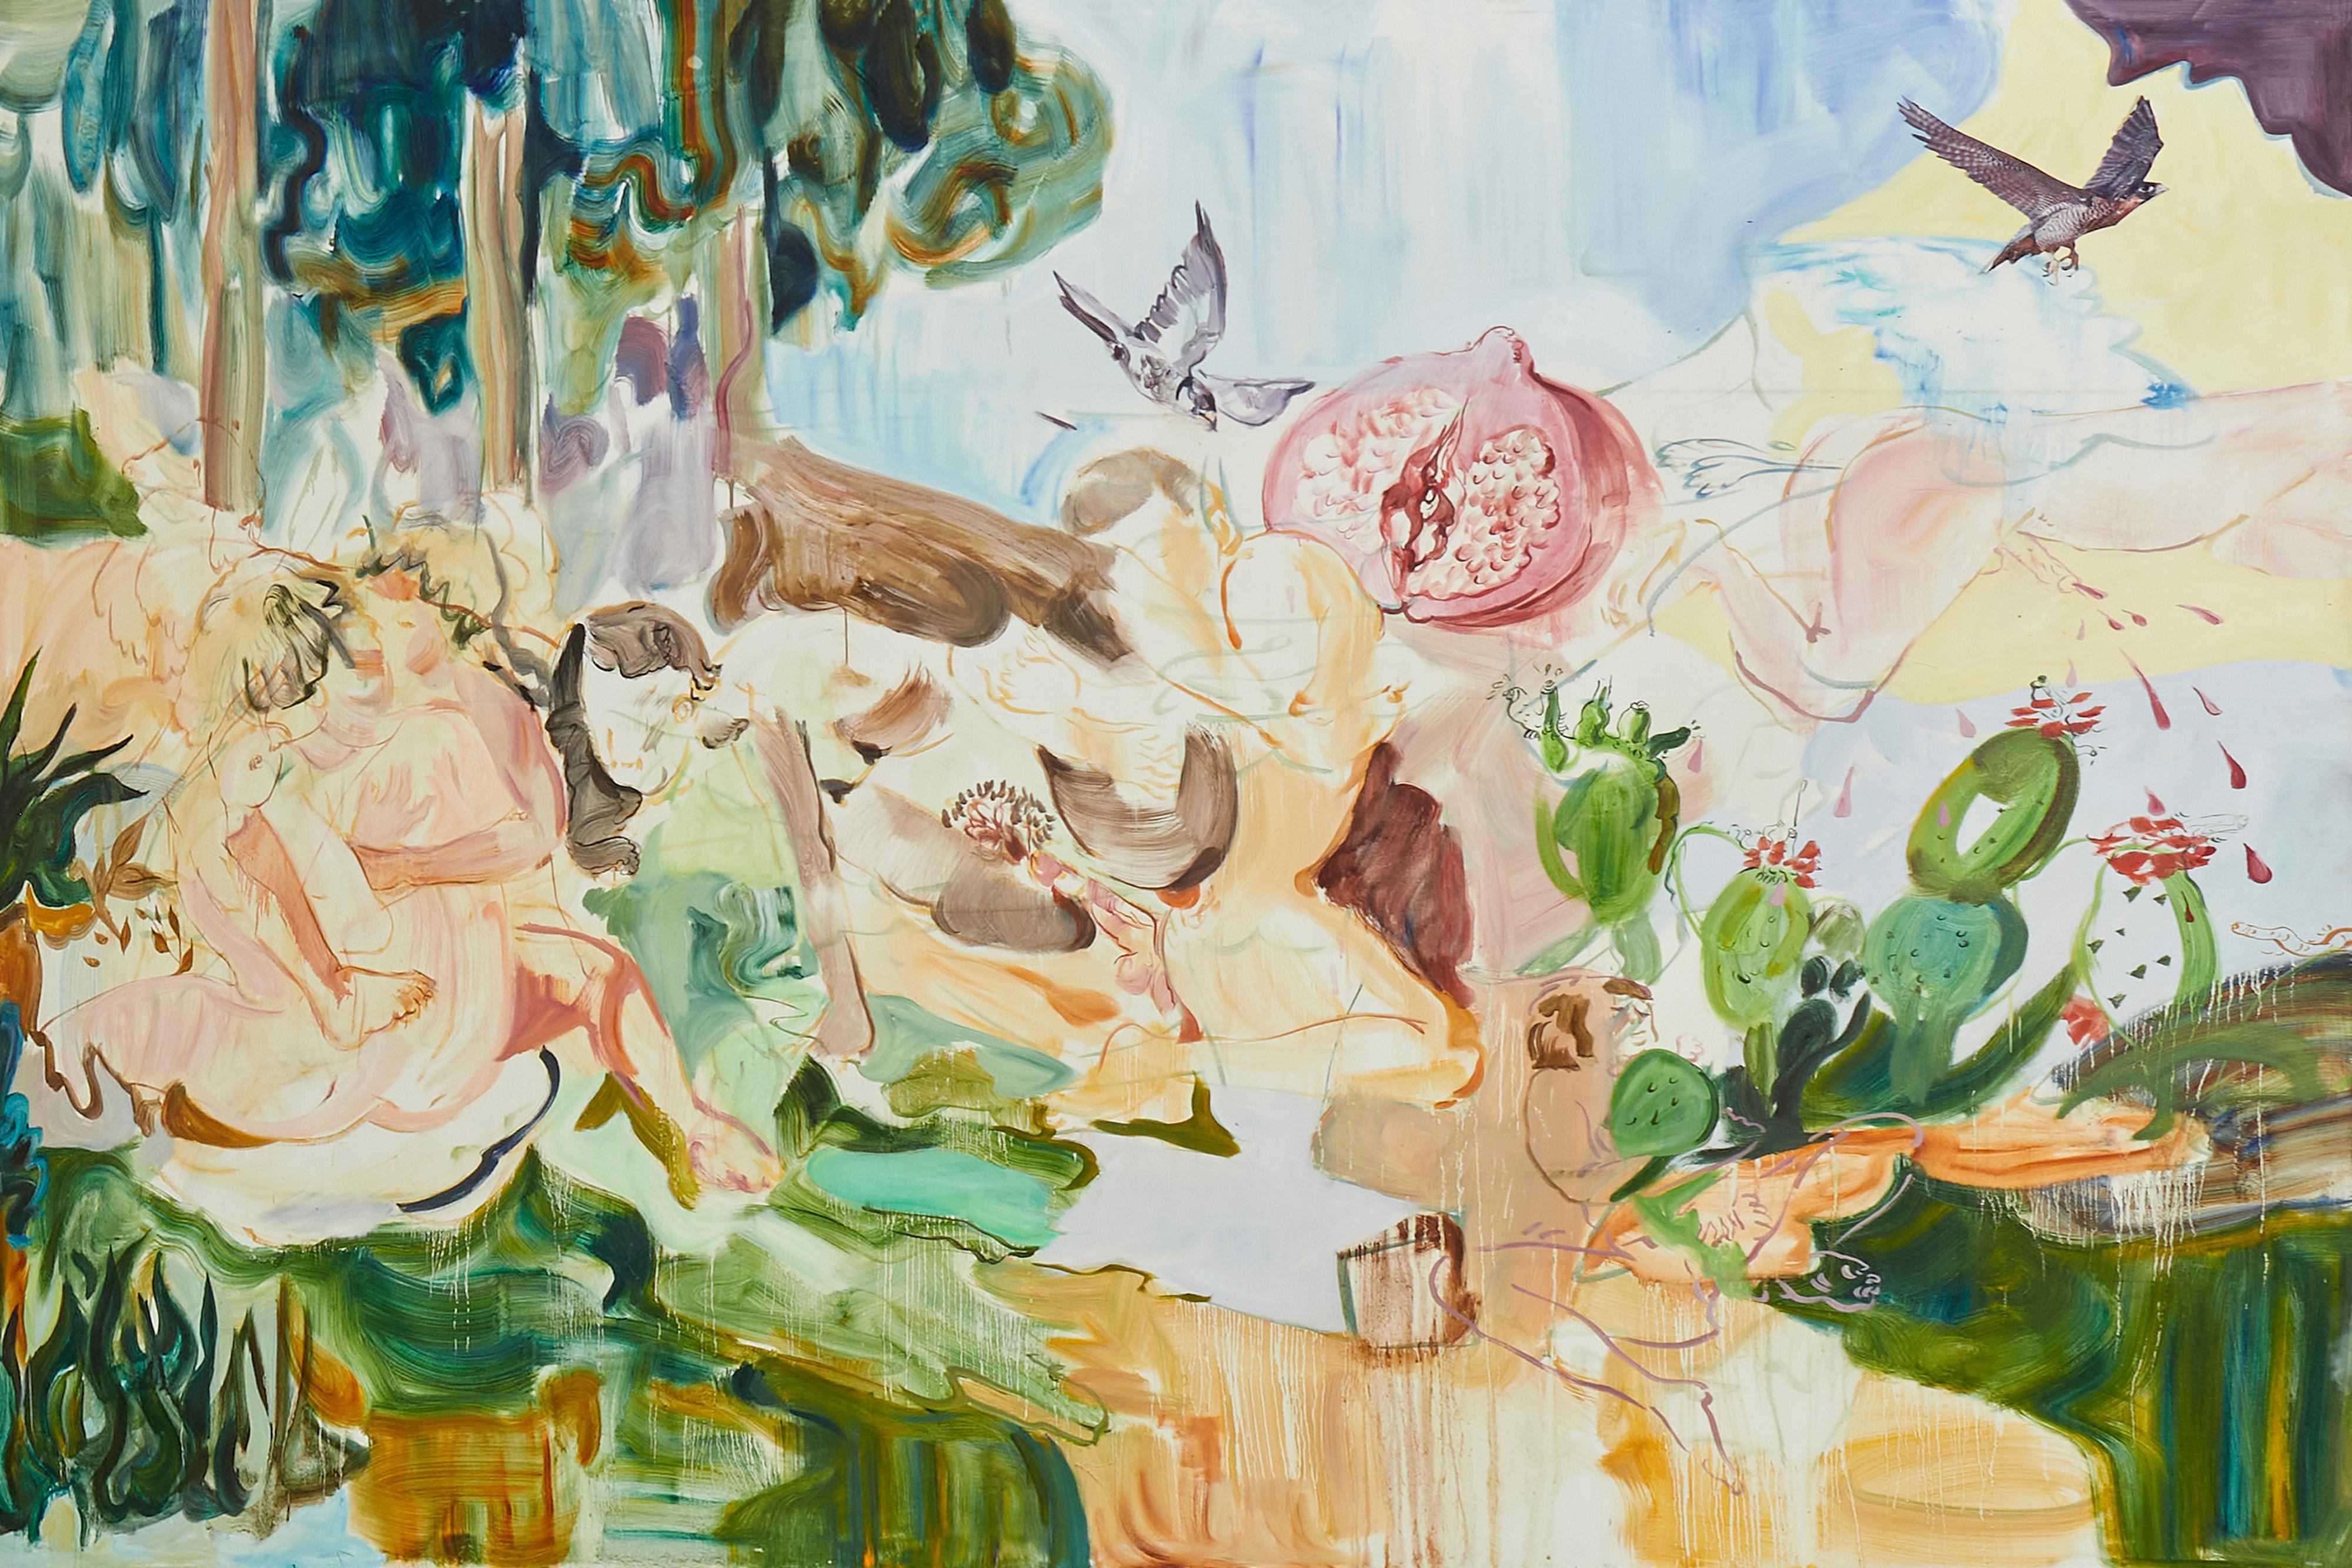 Galerie Barbara Thumm \ New Viewings #31 \ New Viewings #31